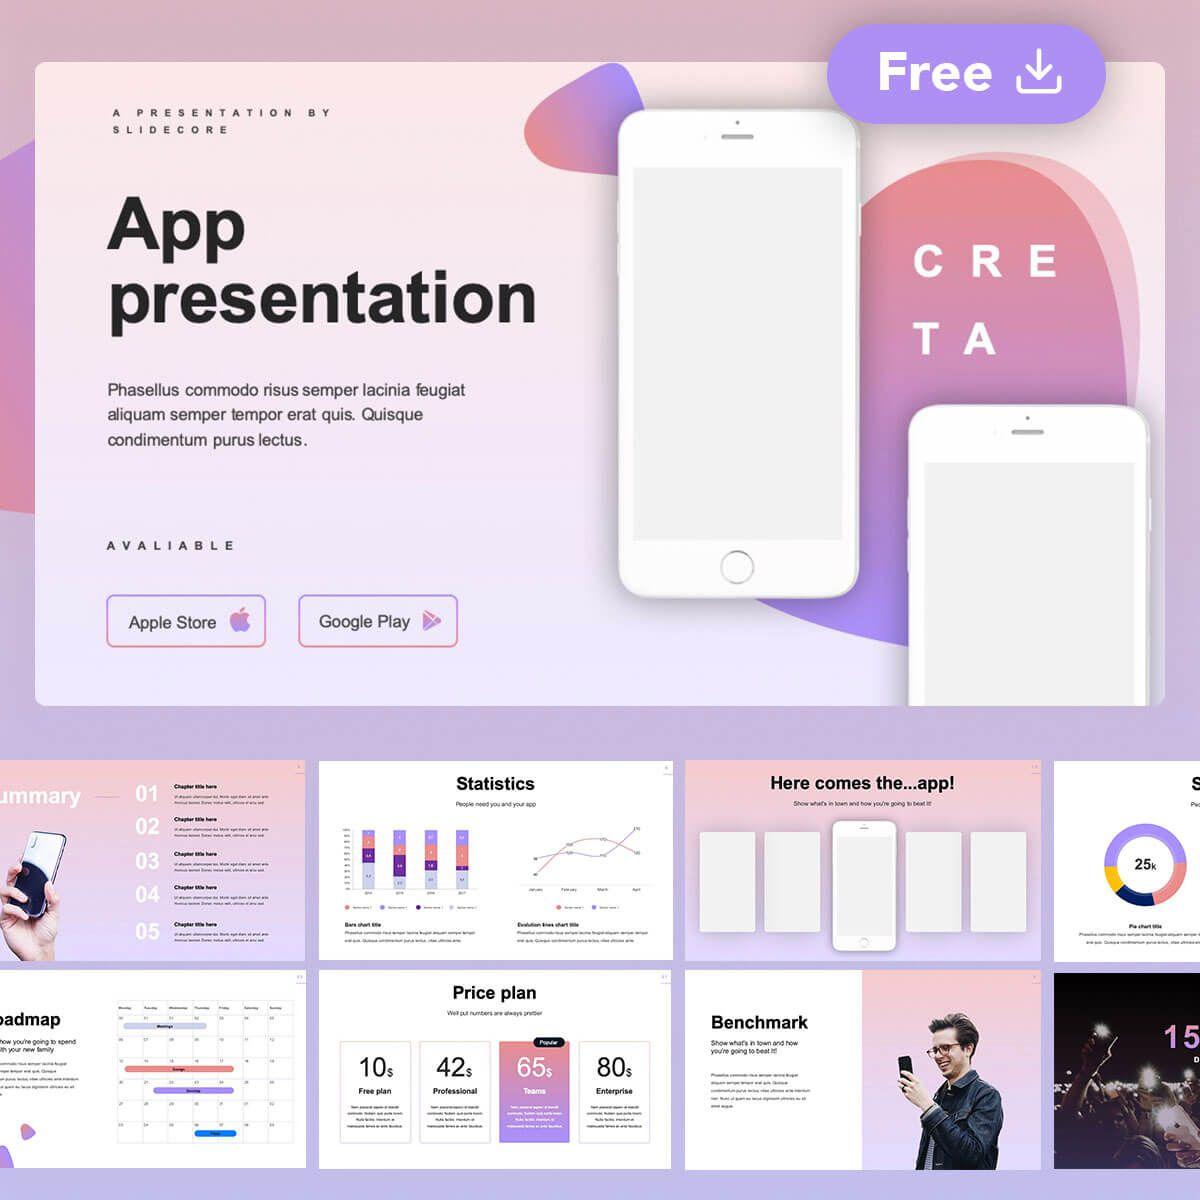 Creta Free App Presentation Powerpoint Google Slides Template By Slidecore Presentation App Presentation Slides Design Powerpoint Slide Designs